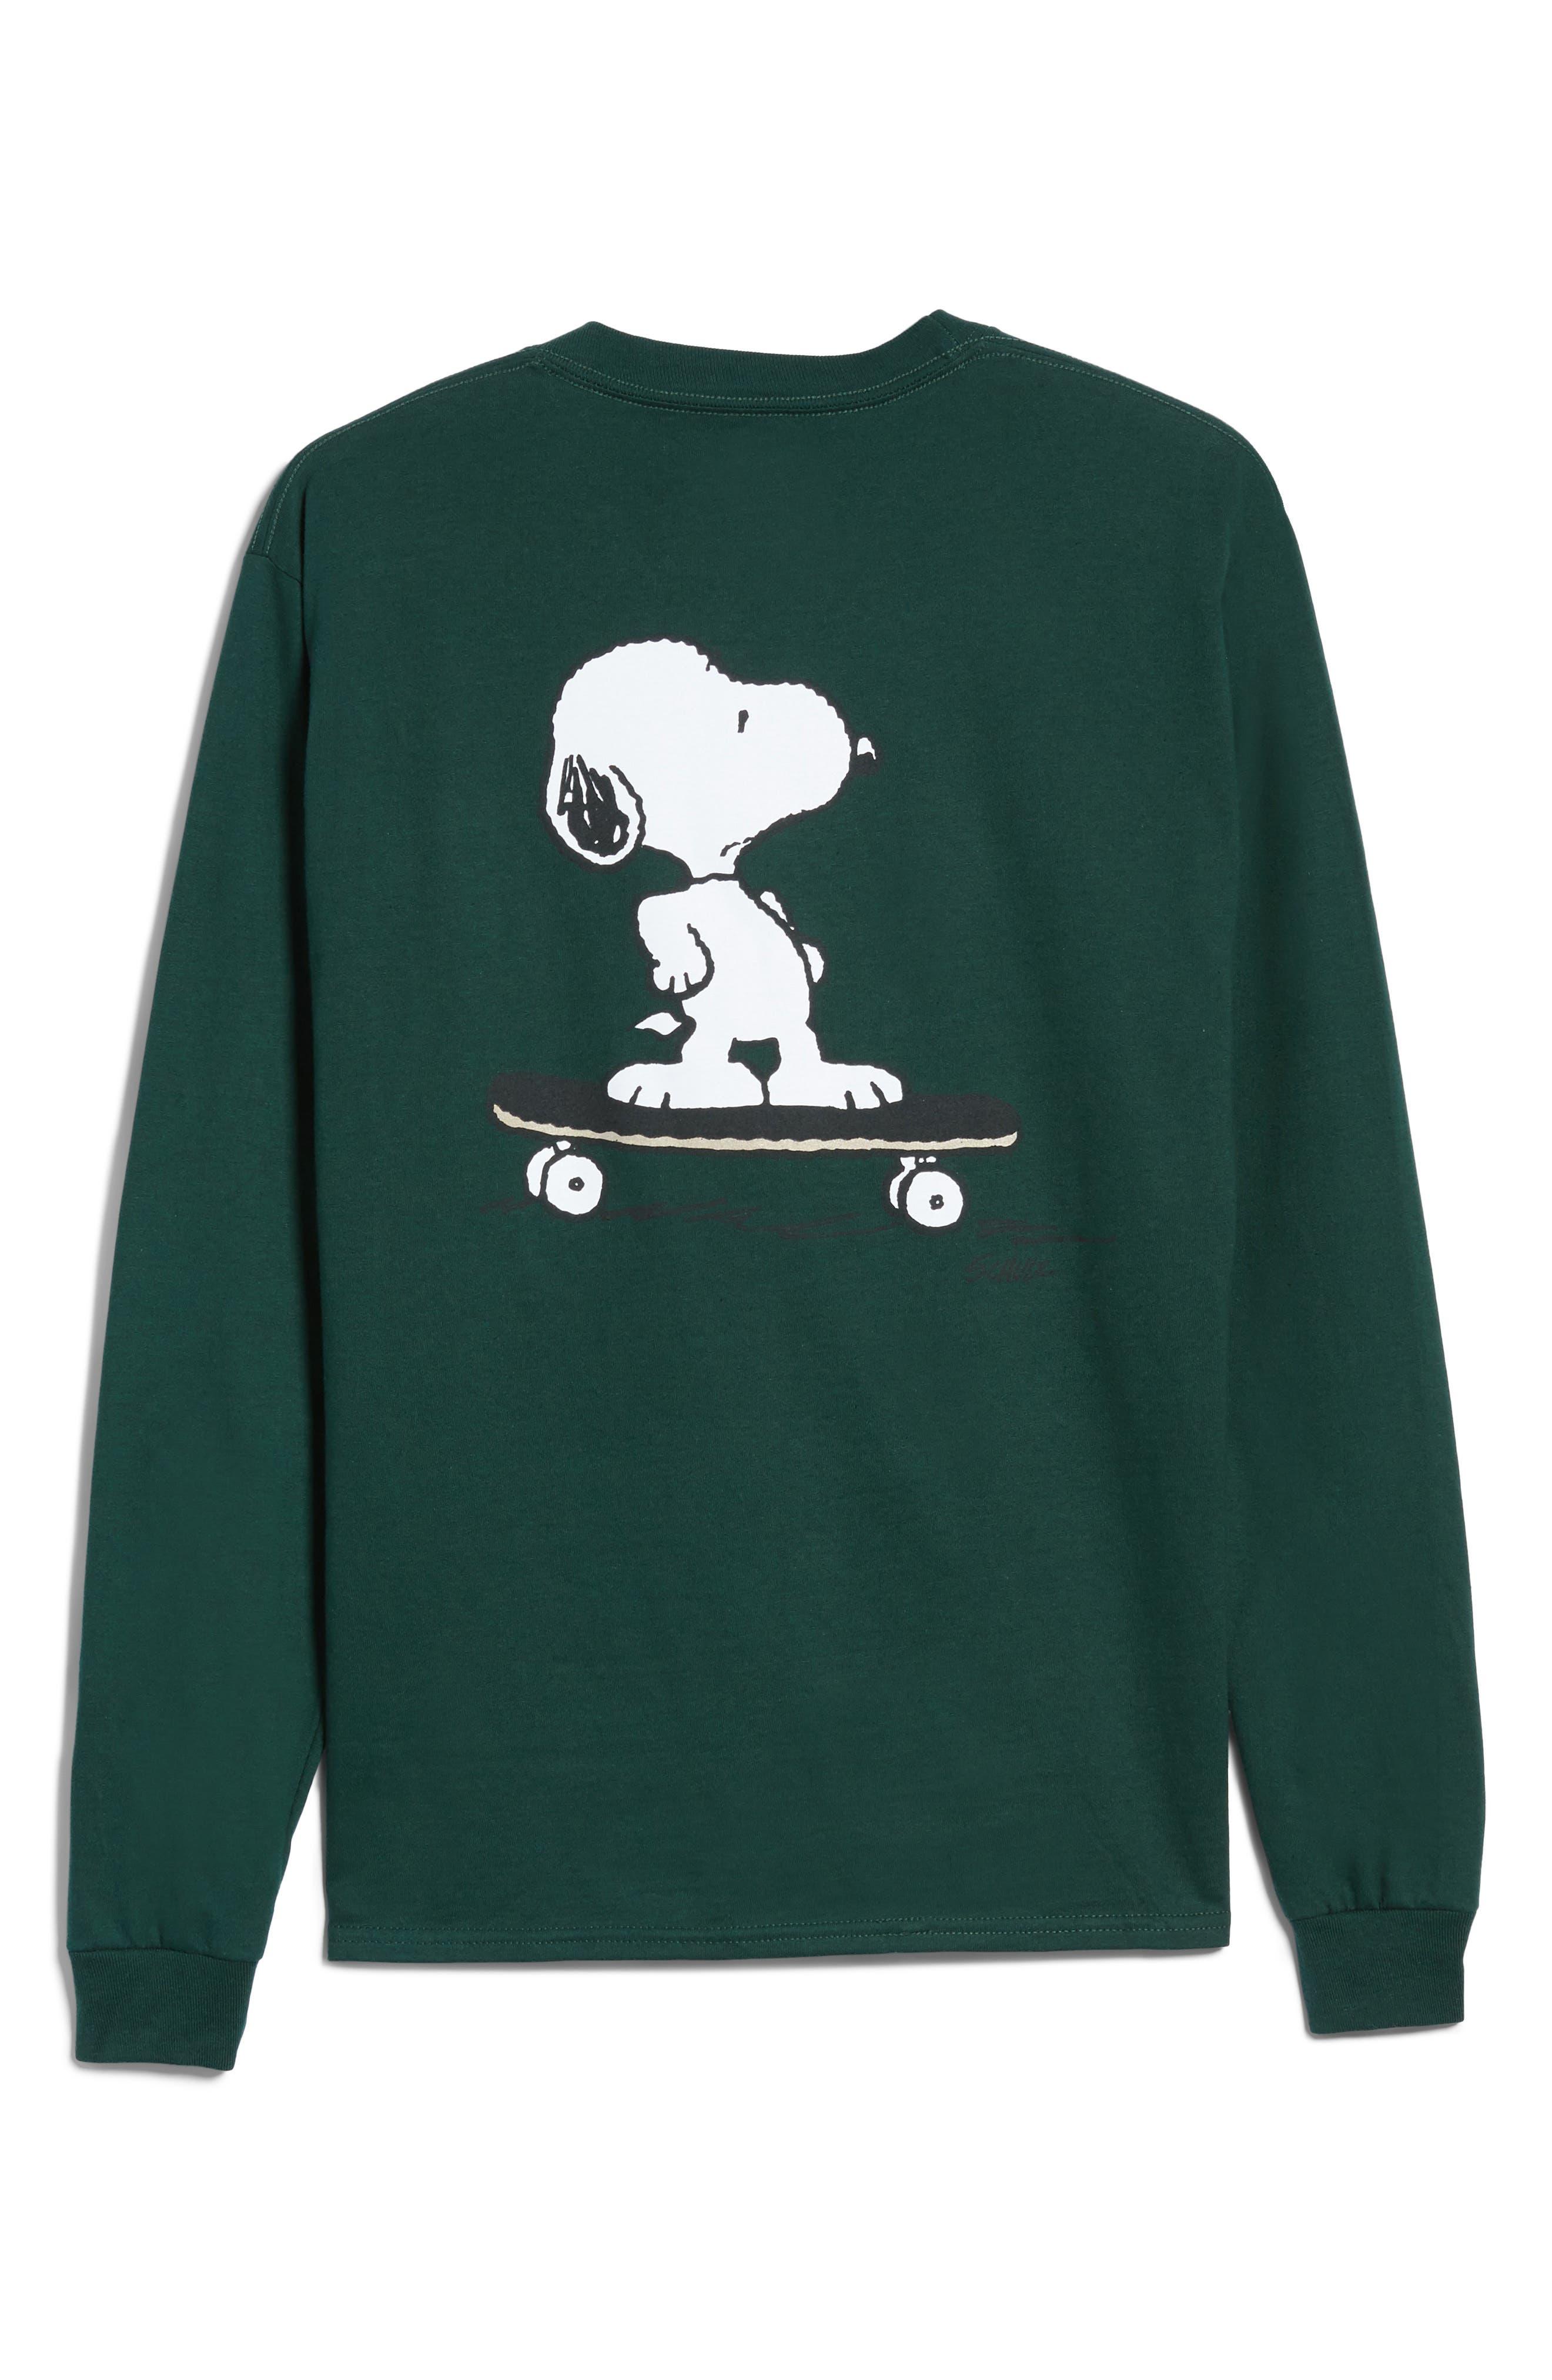 Alternate Image 1 Selected - Peanuts Snoopy Skate Long Sleeve T-Shirt